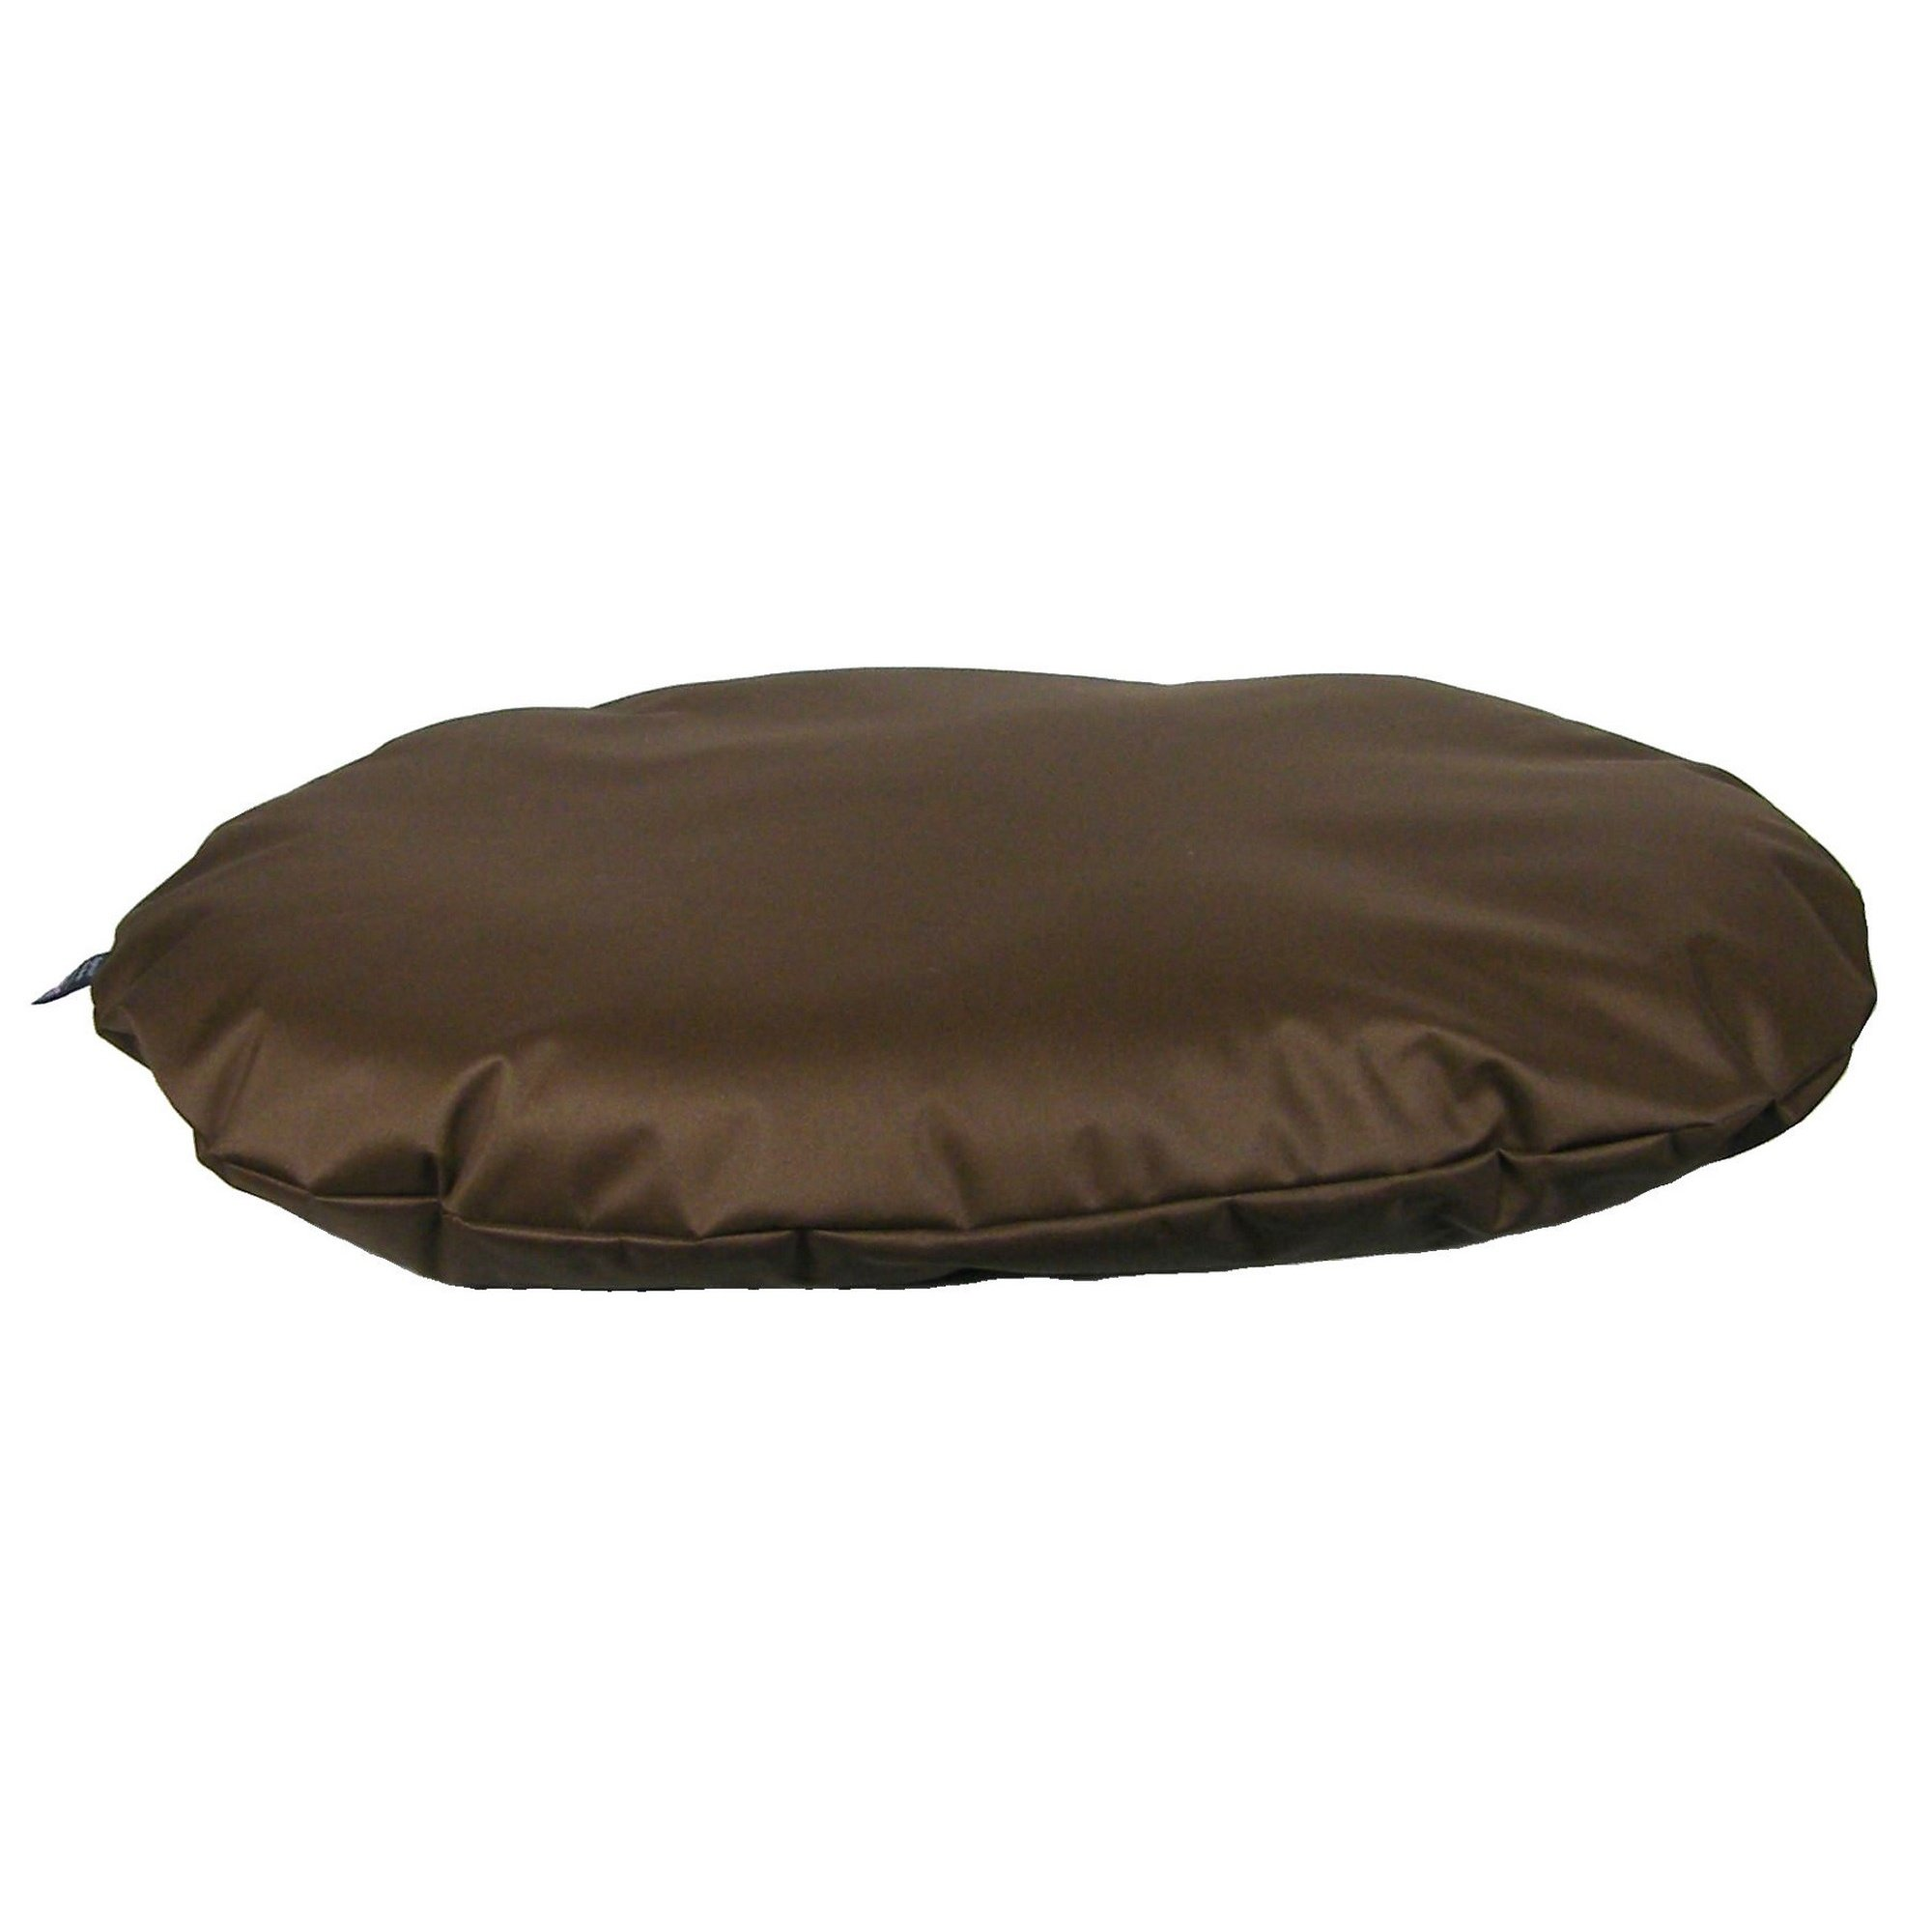 P&L Superior Country Dog Heavy Duty Waterproof Dog Oval Cushion (Medium) (Brown)